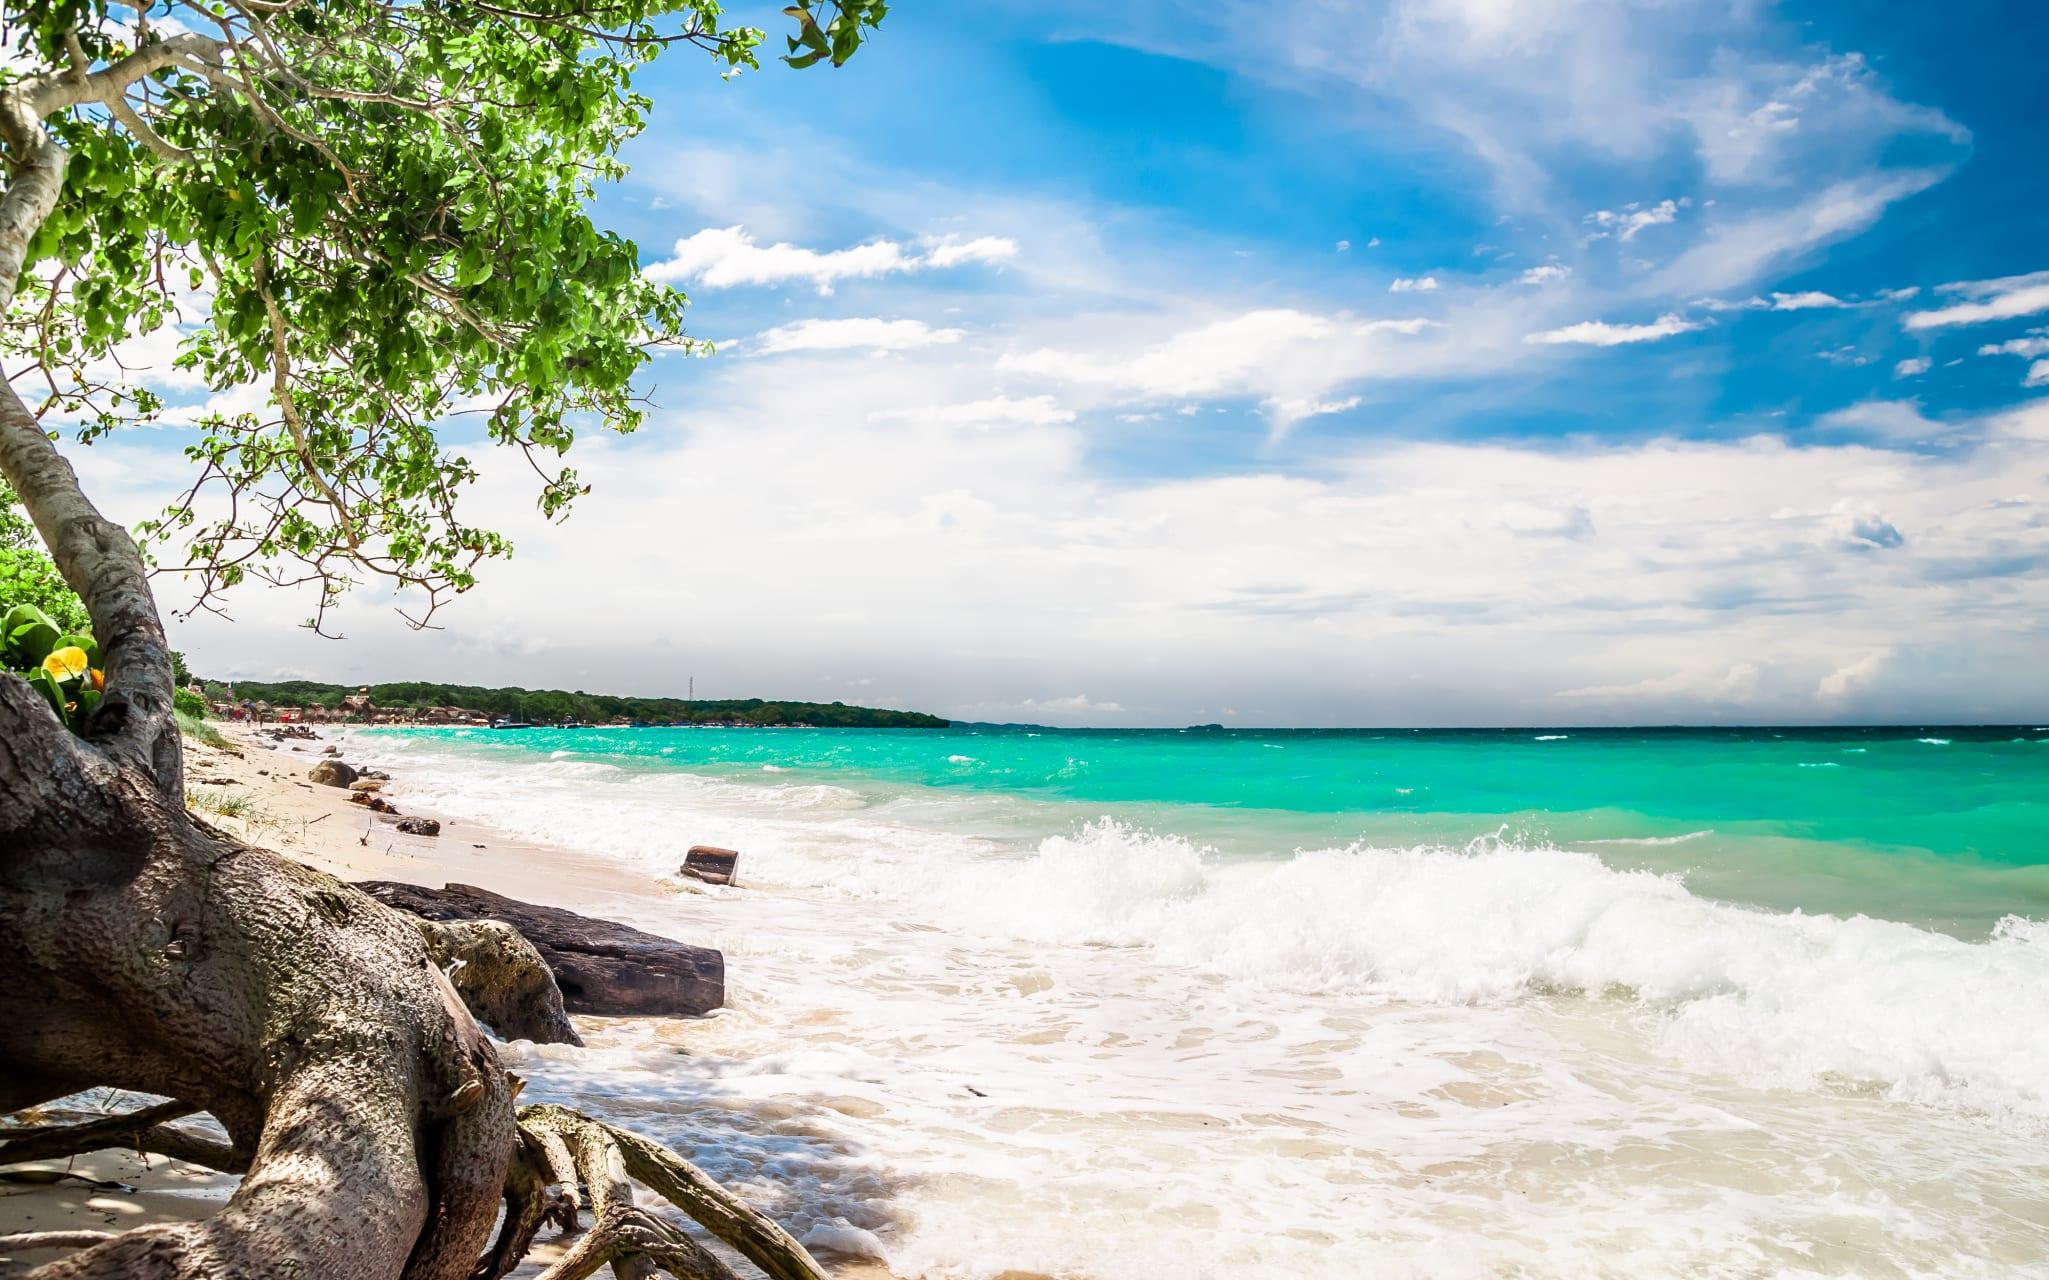 Cartagena - Beach Tour at Playa Blanca in Baru Island